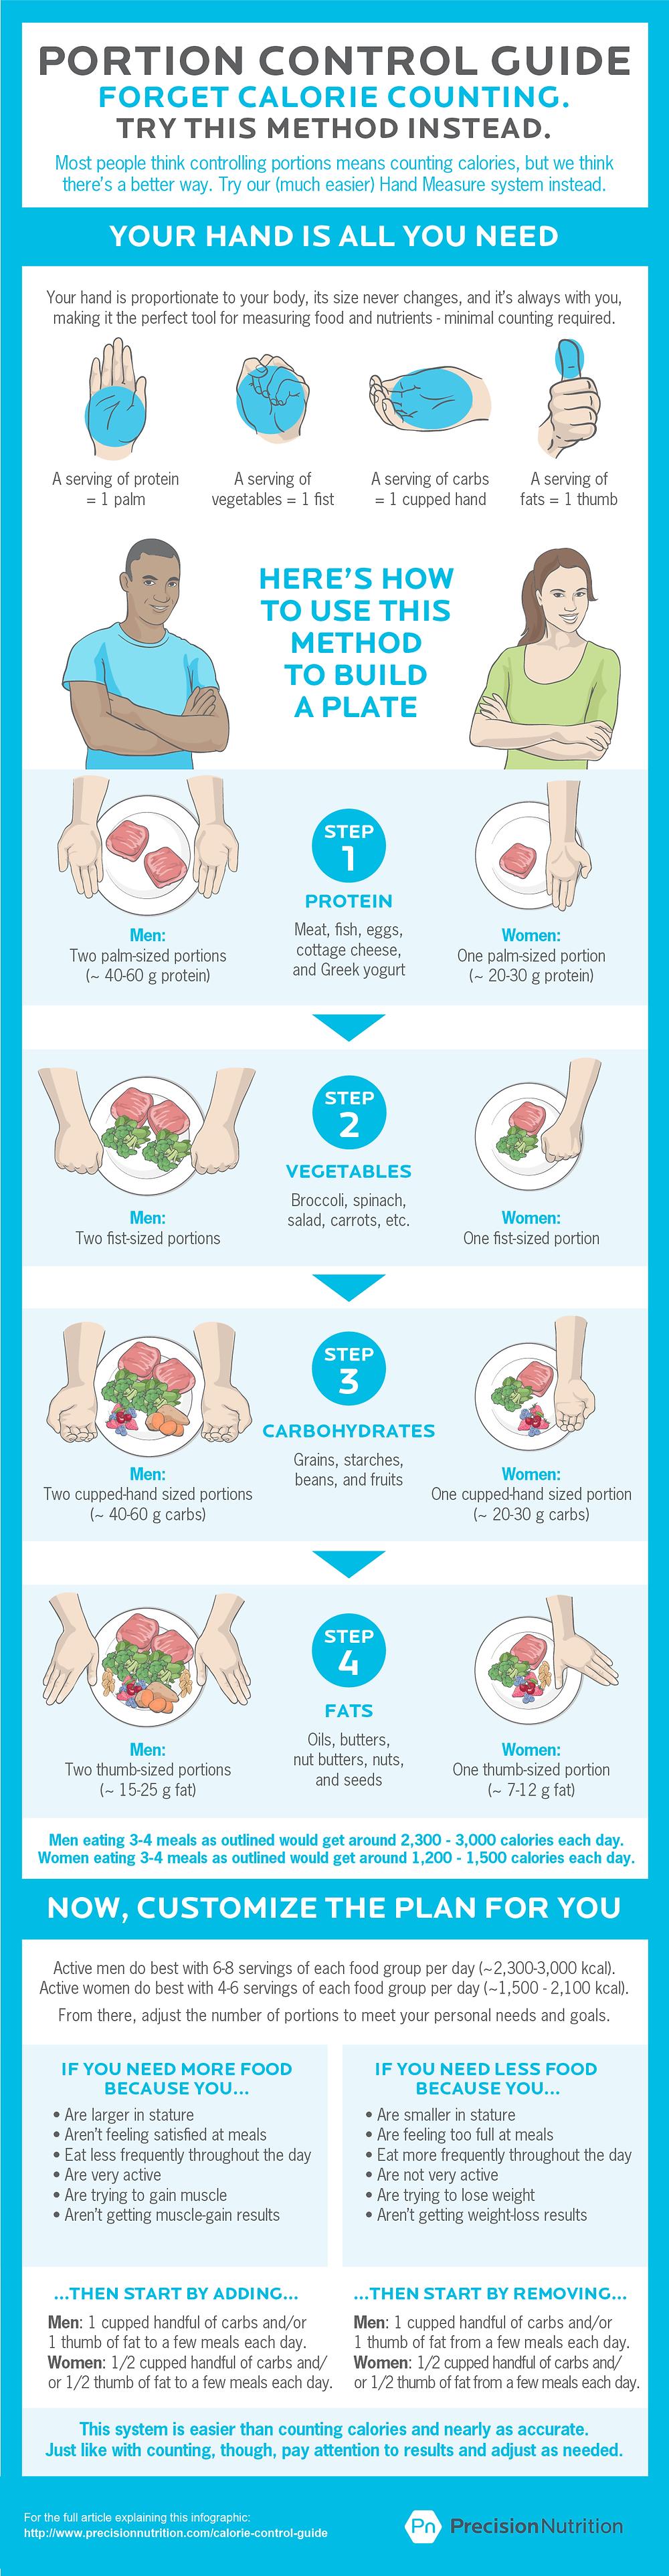 Portion control guide - Precision Nutrition